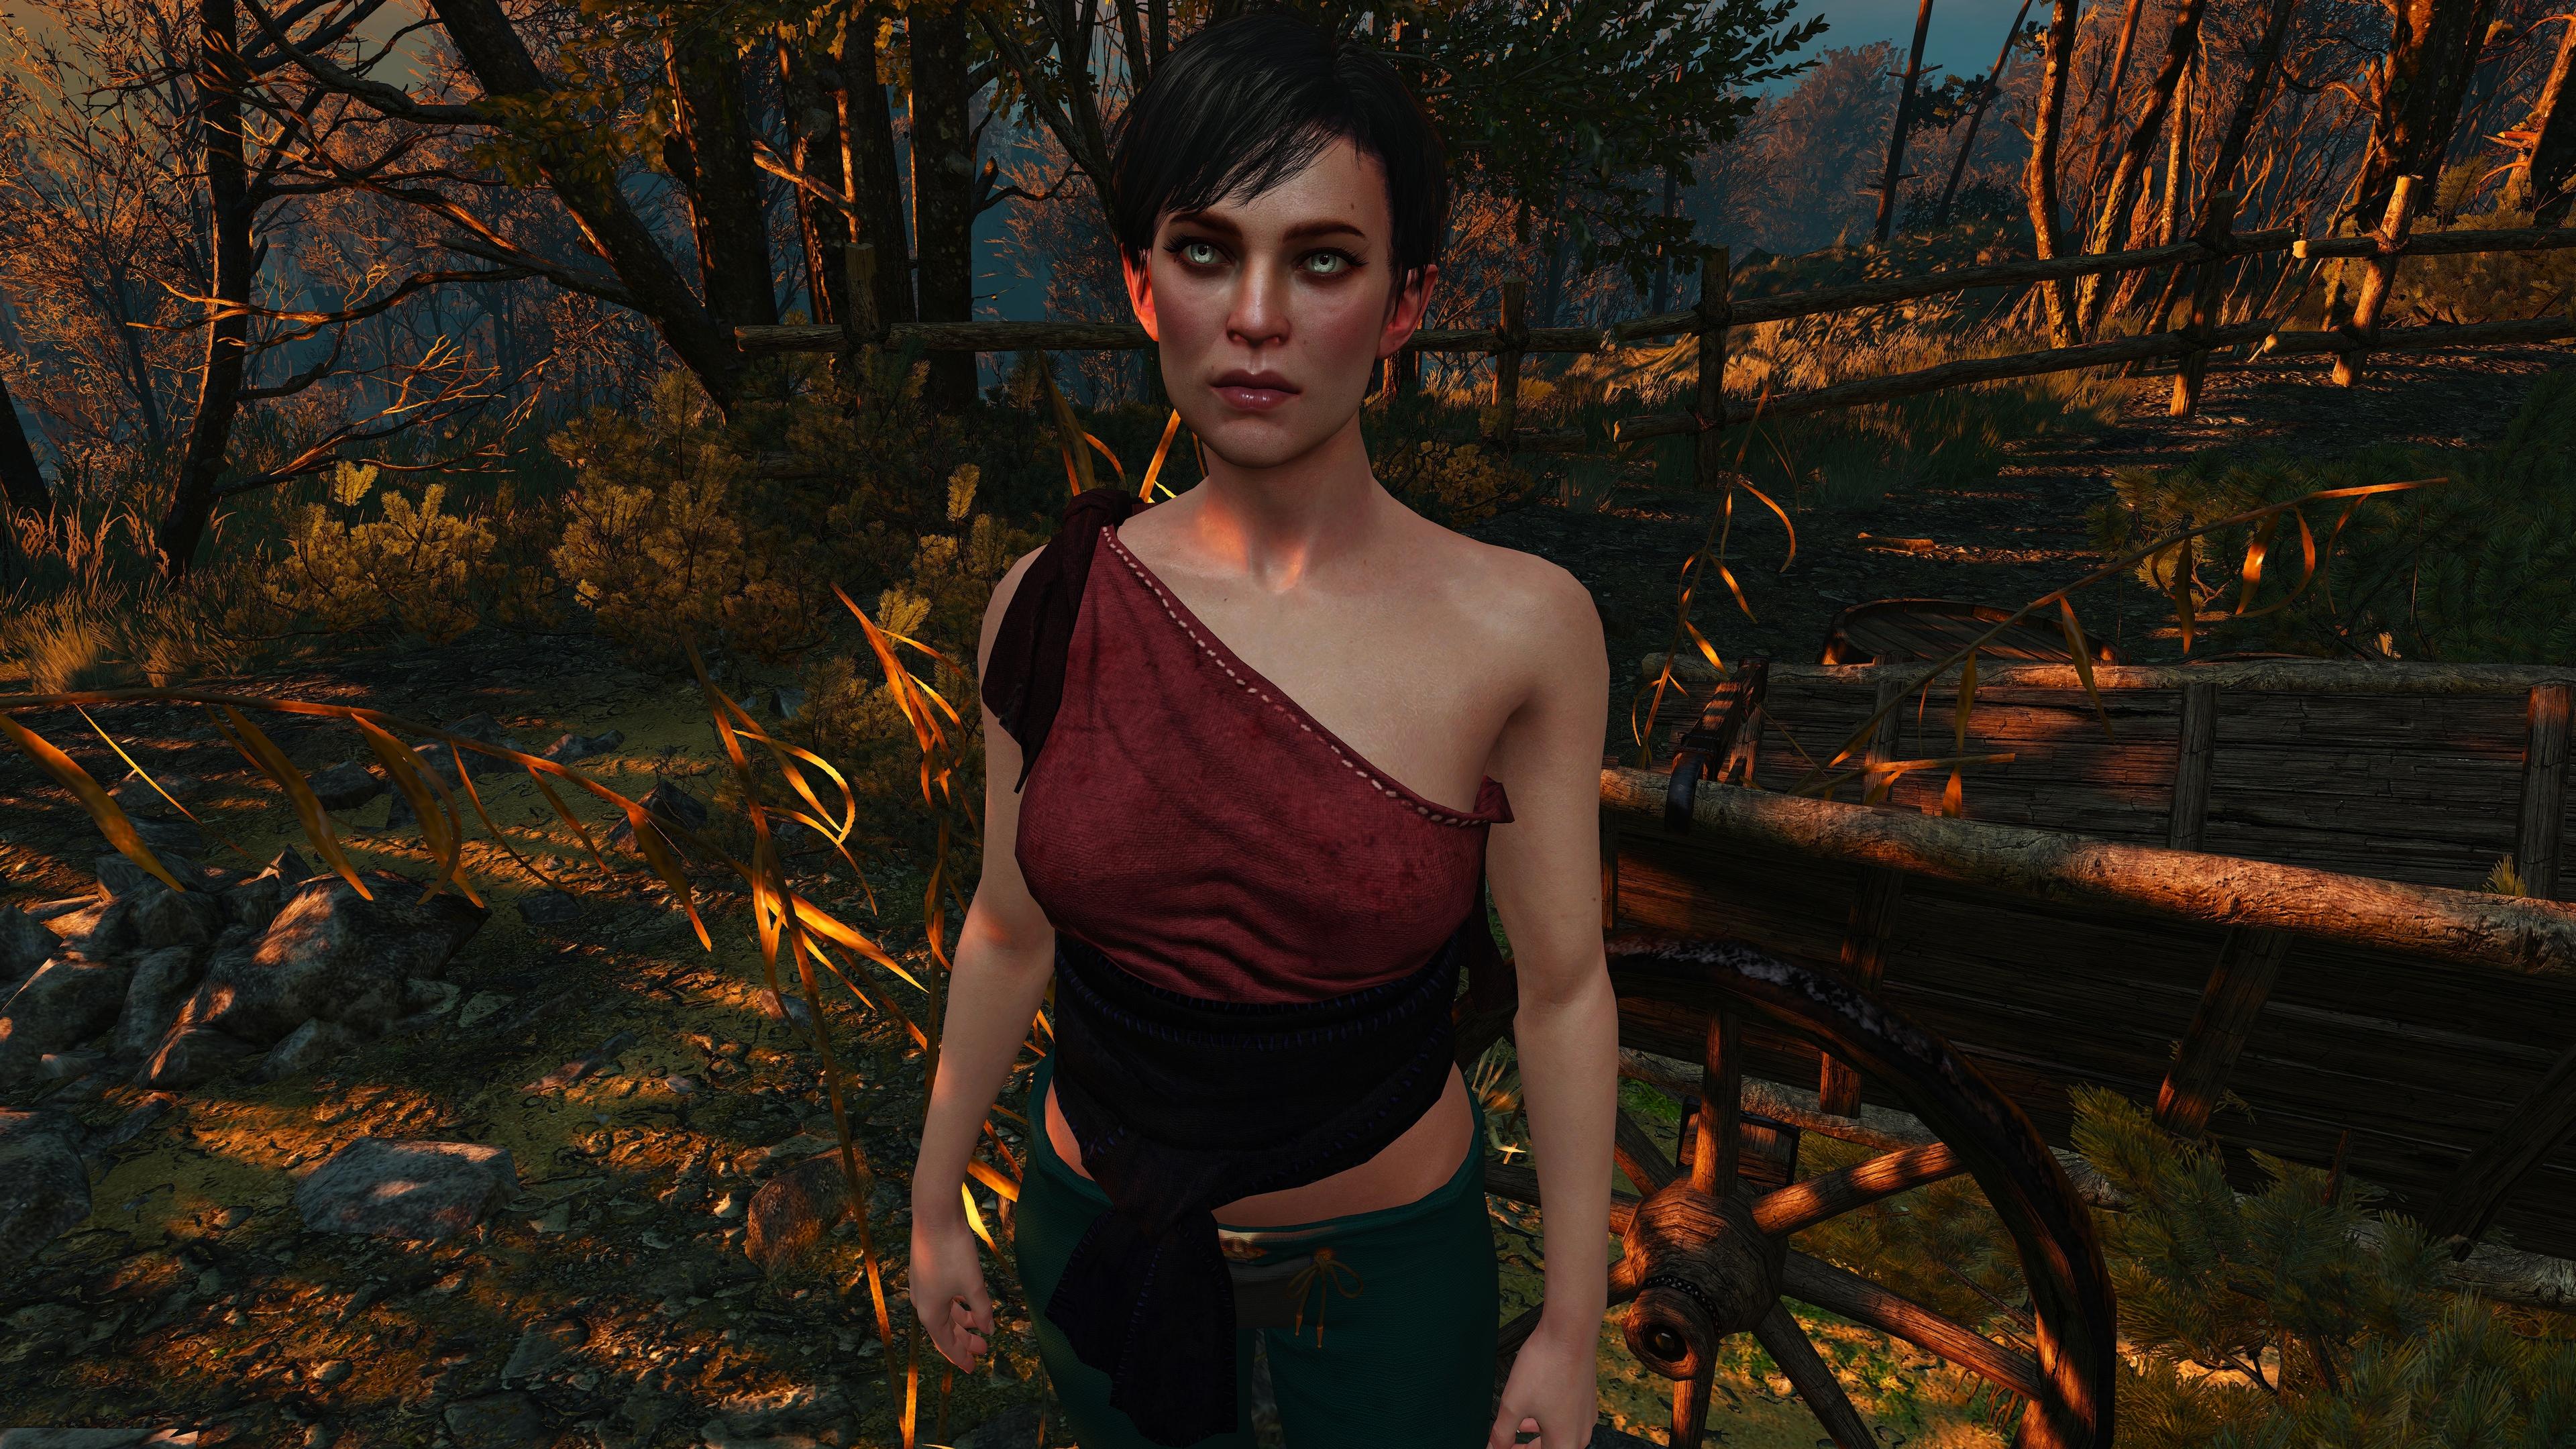 The Witcher 3 Screenshot 2020.07.23 - 20.17.18.95.jpg - The Witcher 3: Wild Hunt